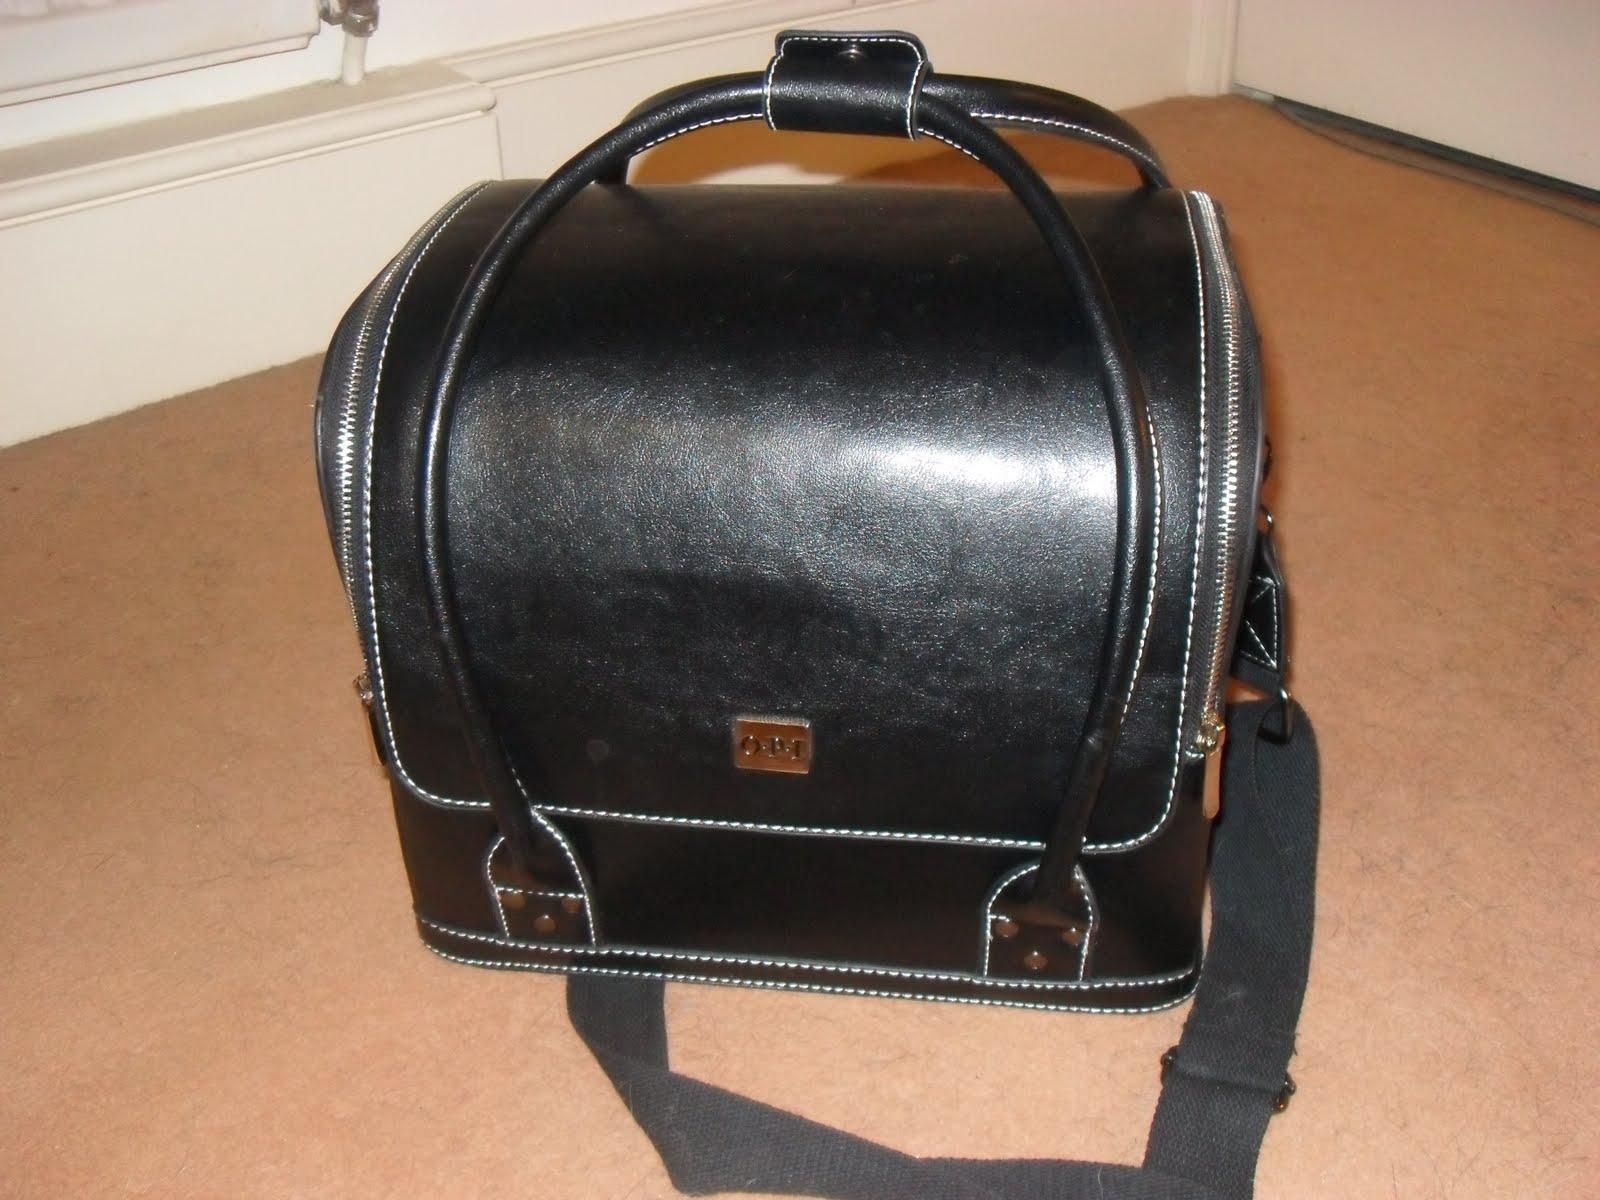 Opi Nail Polish Carry Case